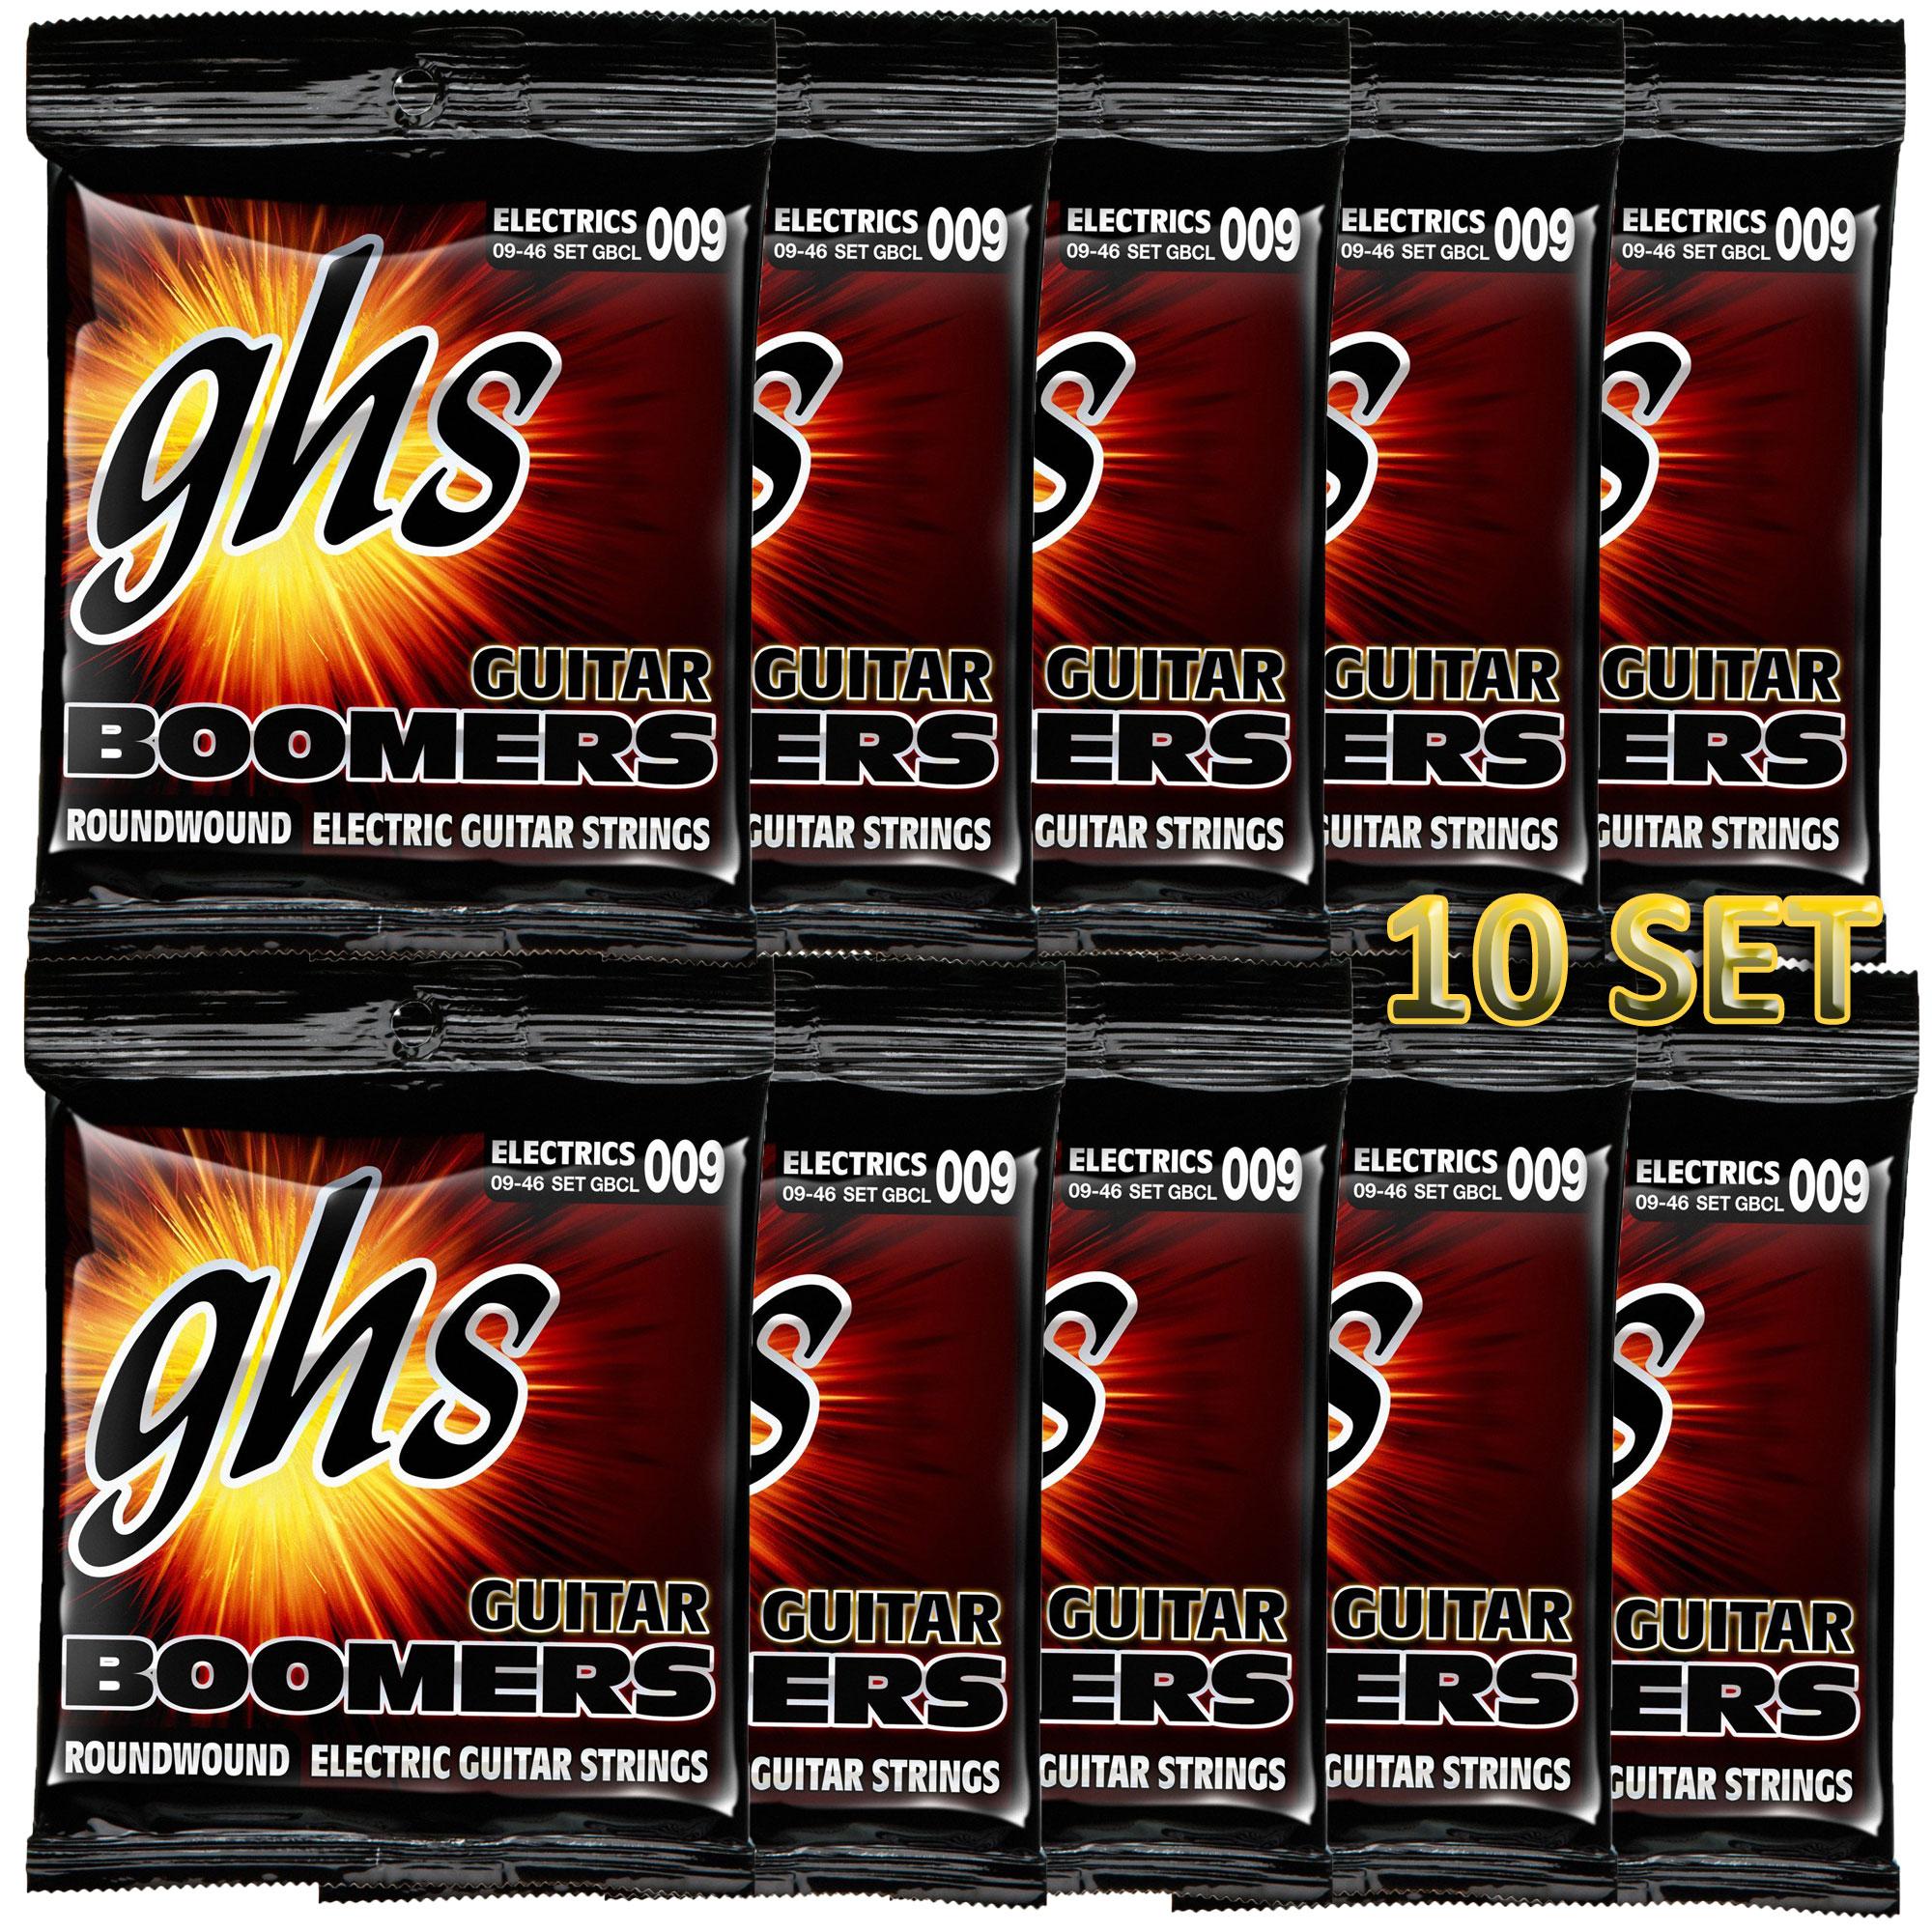 GHS GBCL - 10 SET ELETTRICA 09-46